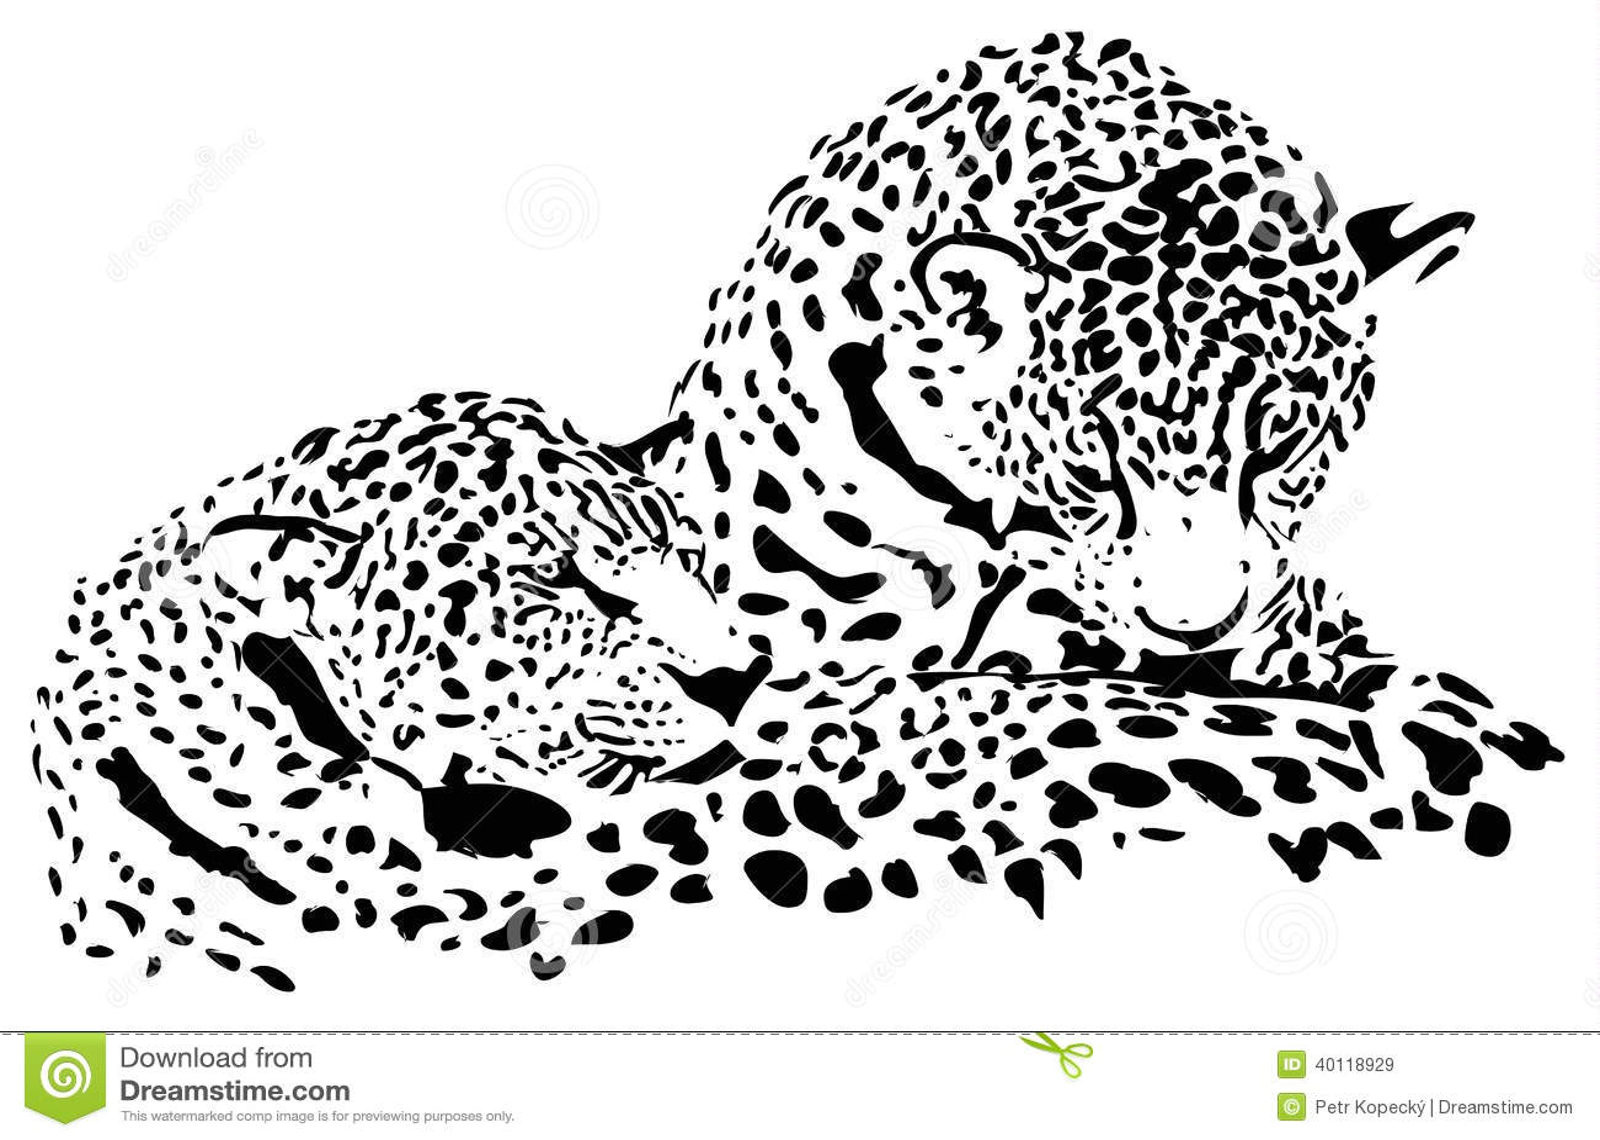 Gallery For gt Jaguar Face Stencil